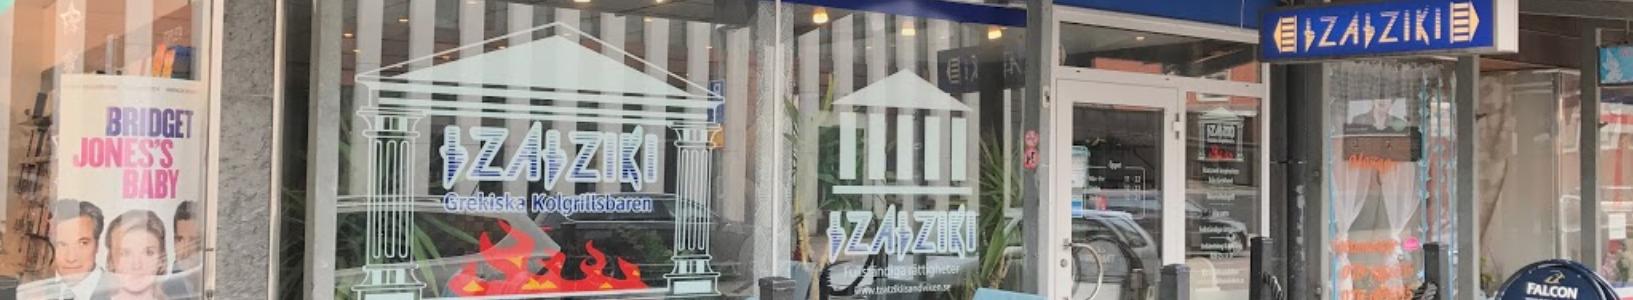 Tzatziki Grekisk Restaurang Sandviken 34